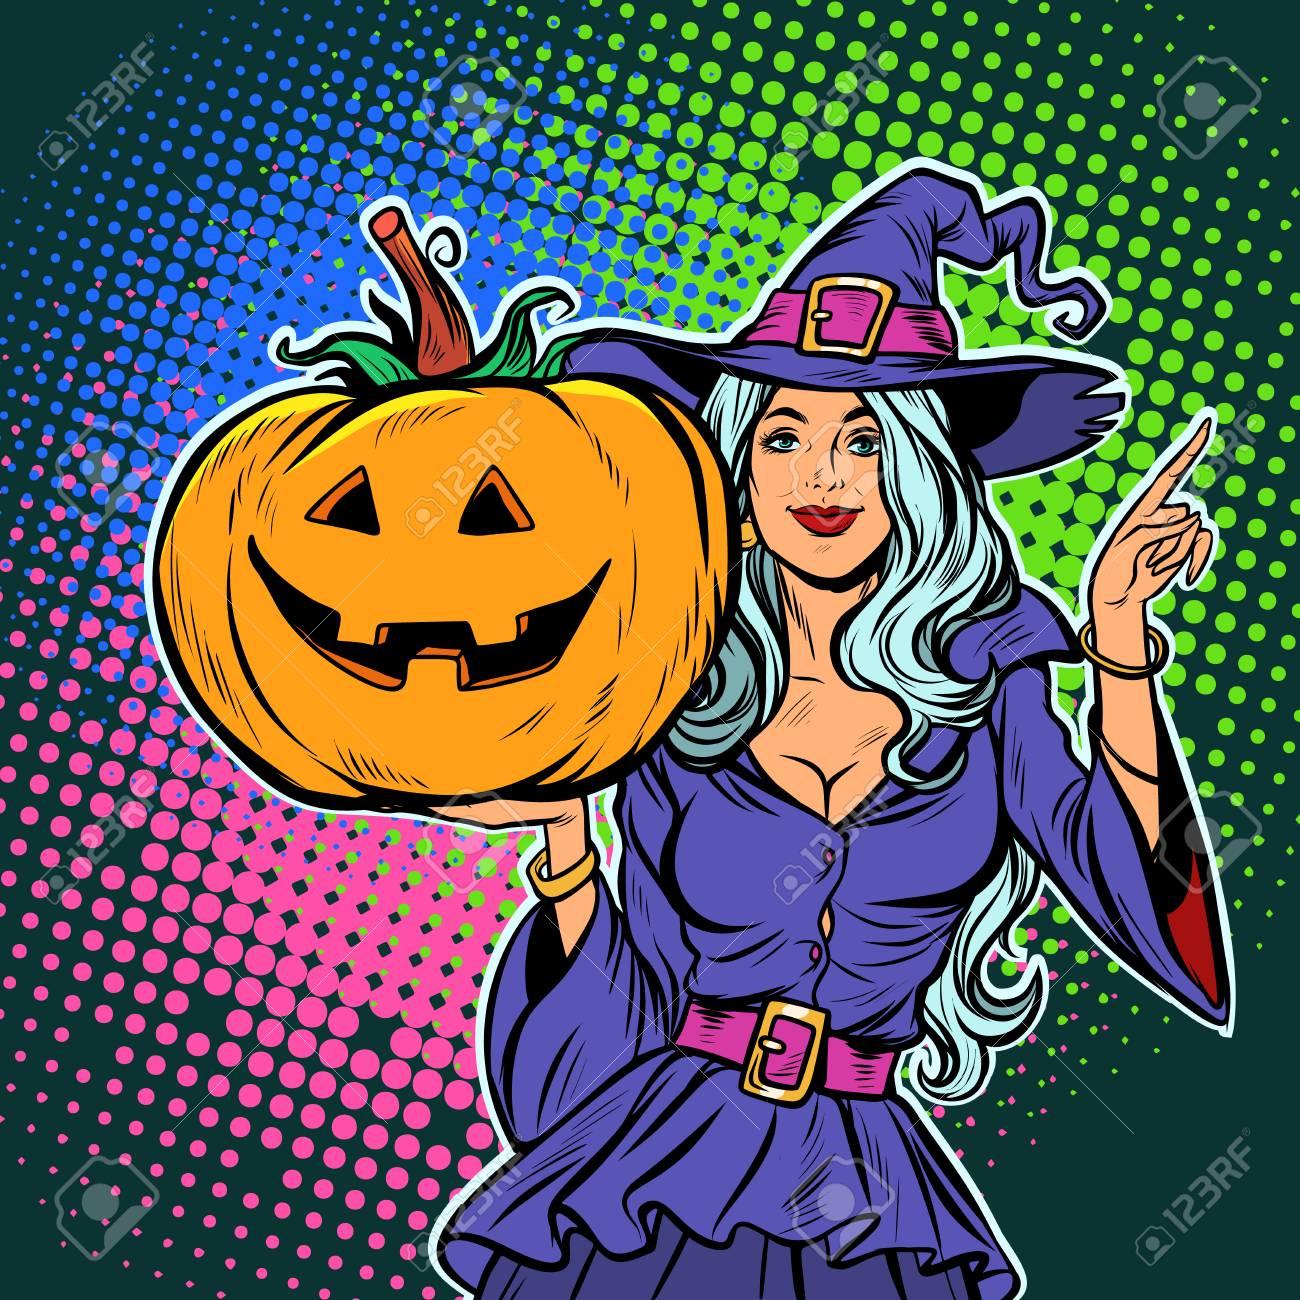 witch with pumpkin. Halloween Party. Pop art retro vector illustration vintage kitsch - 108972895